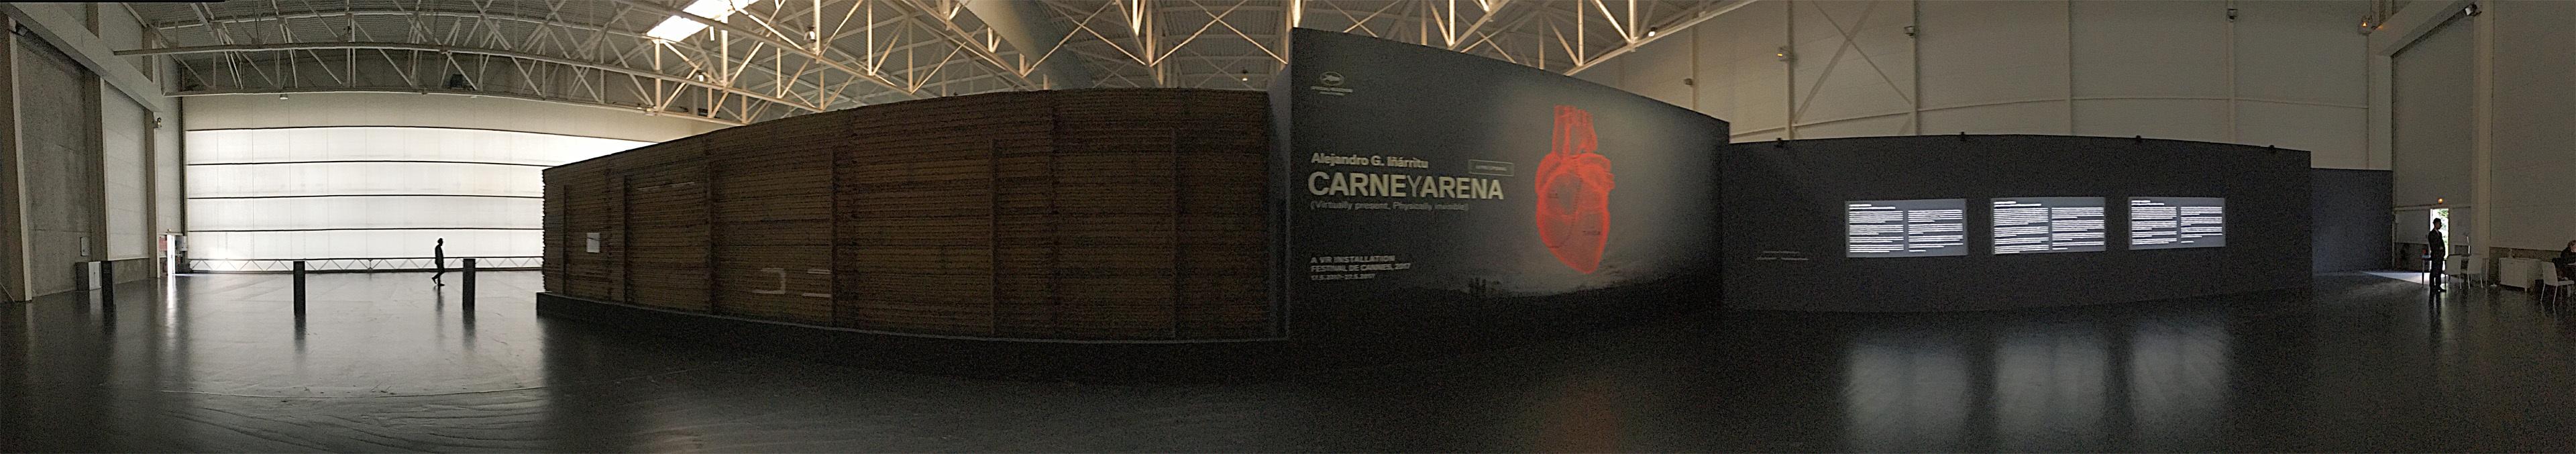 Carne-y-Arena-180-uhd